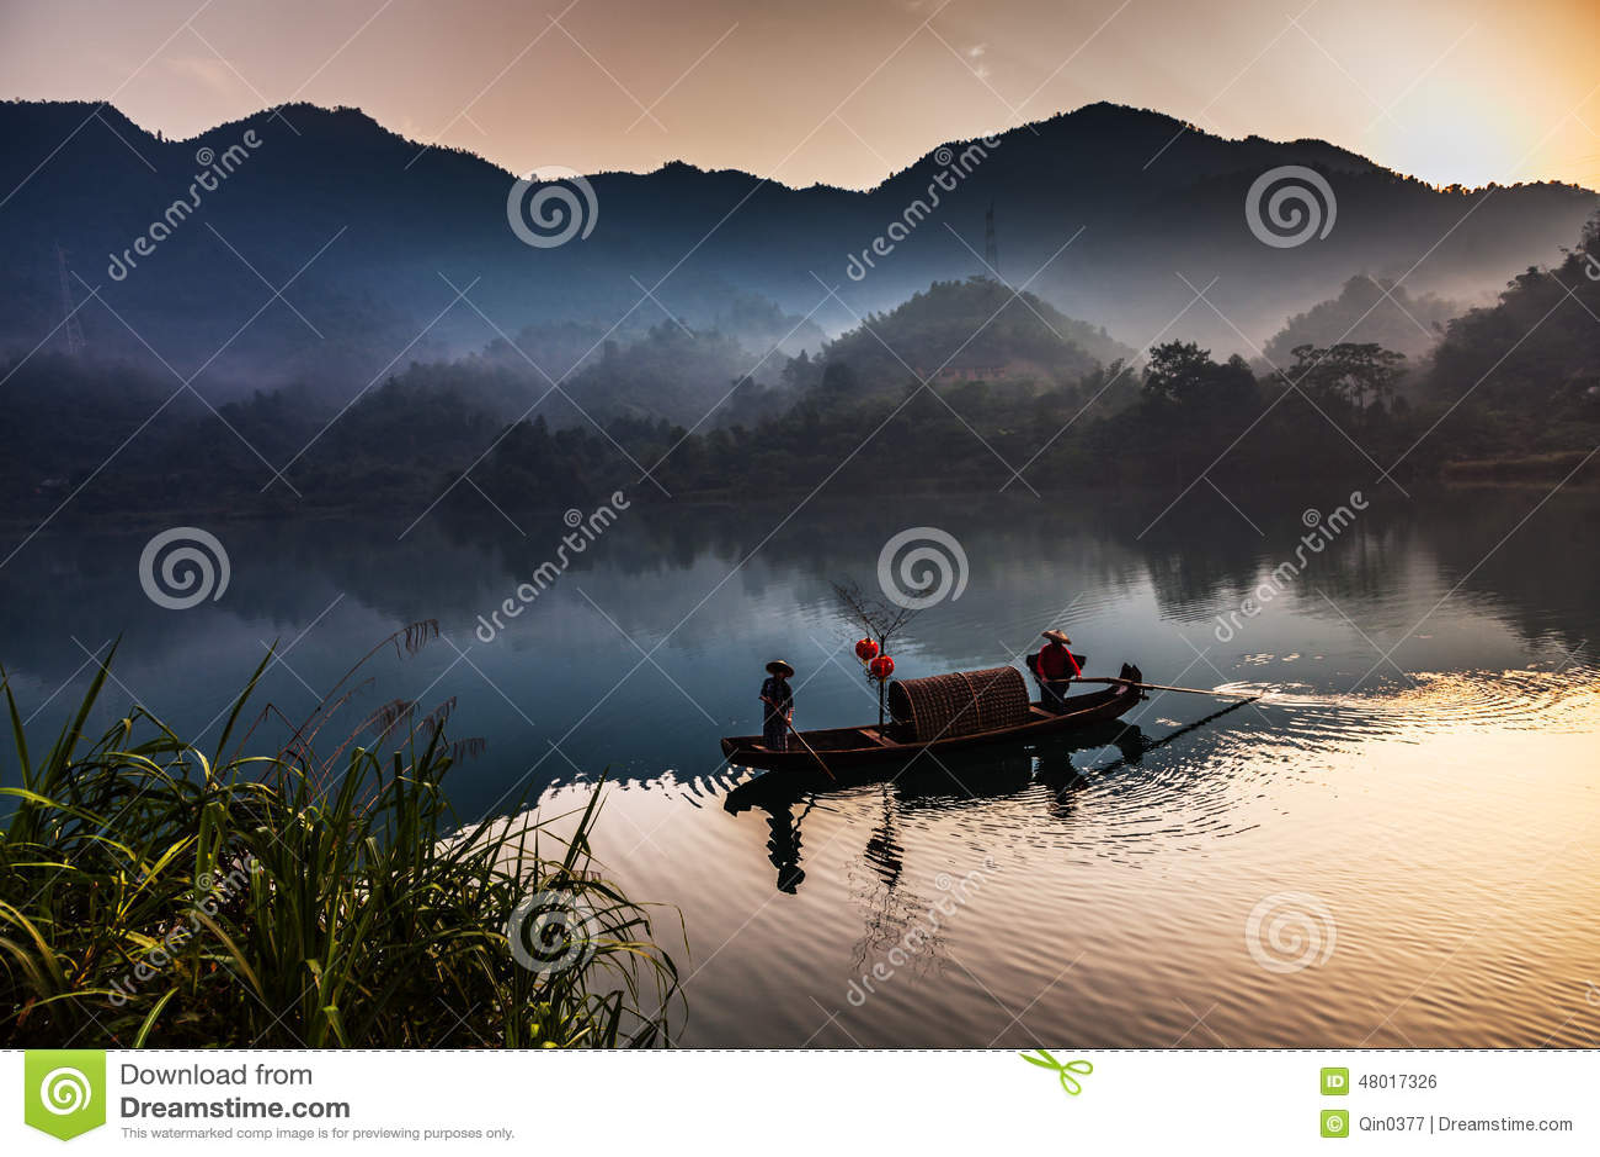 China meridional en primavera